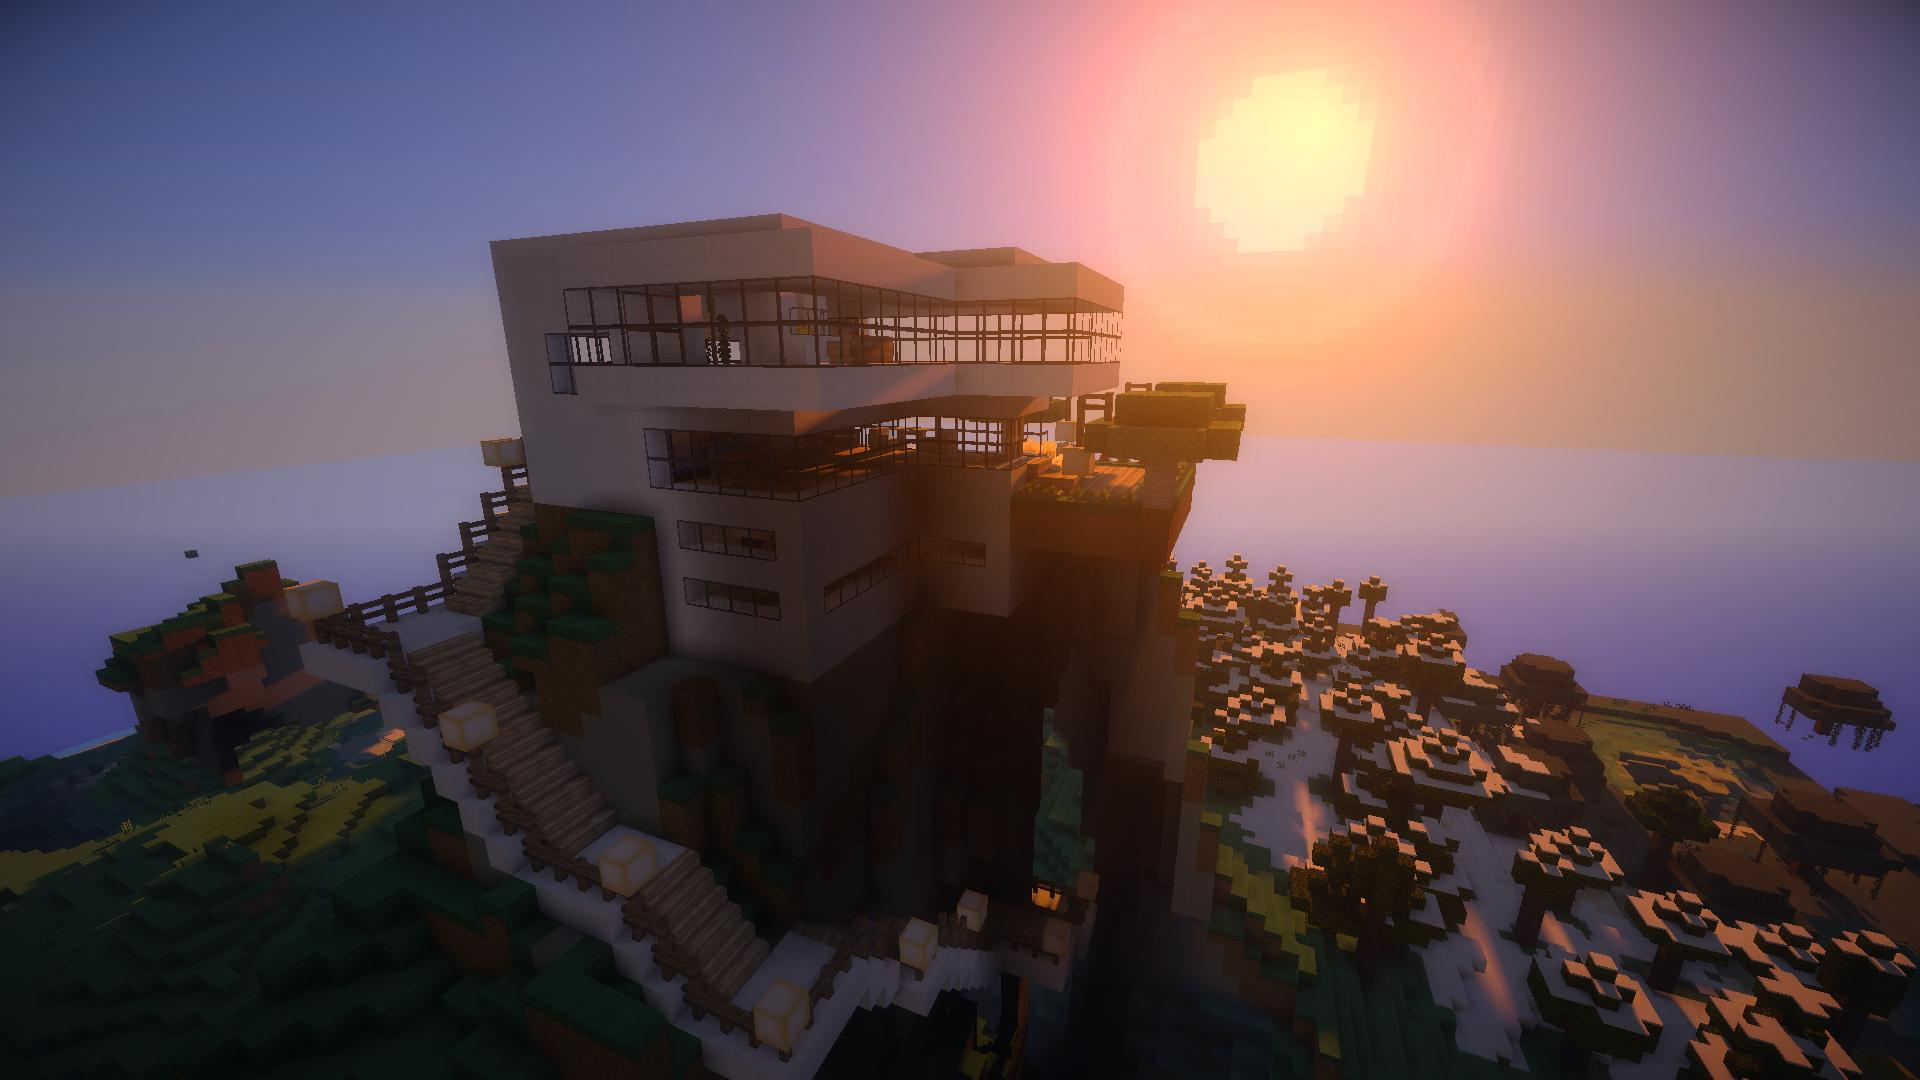 Fabulous Fond d'écran Minecraft : Maison Moderne RY05